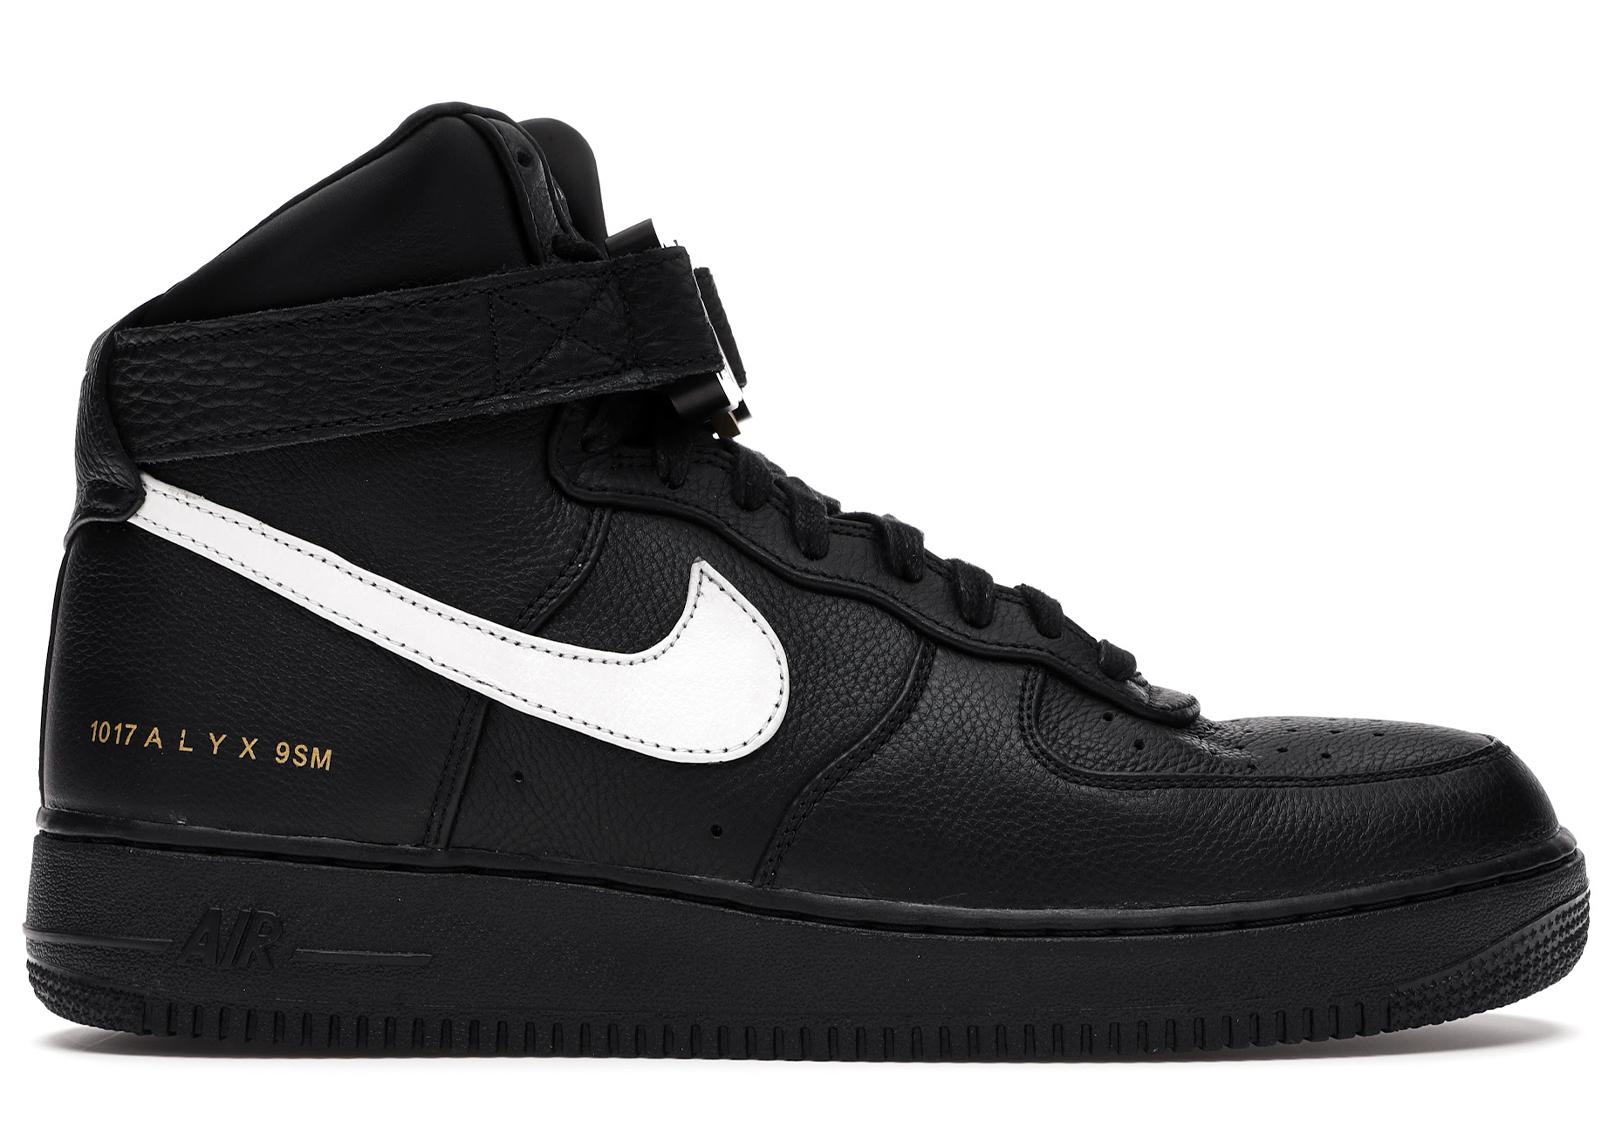 Nike Air Force 1 High 1017 ALYX 9SM Black White